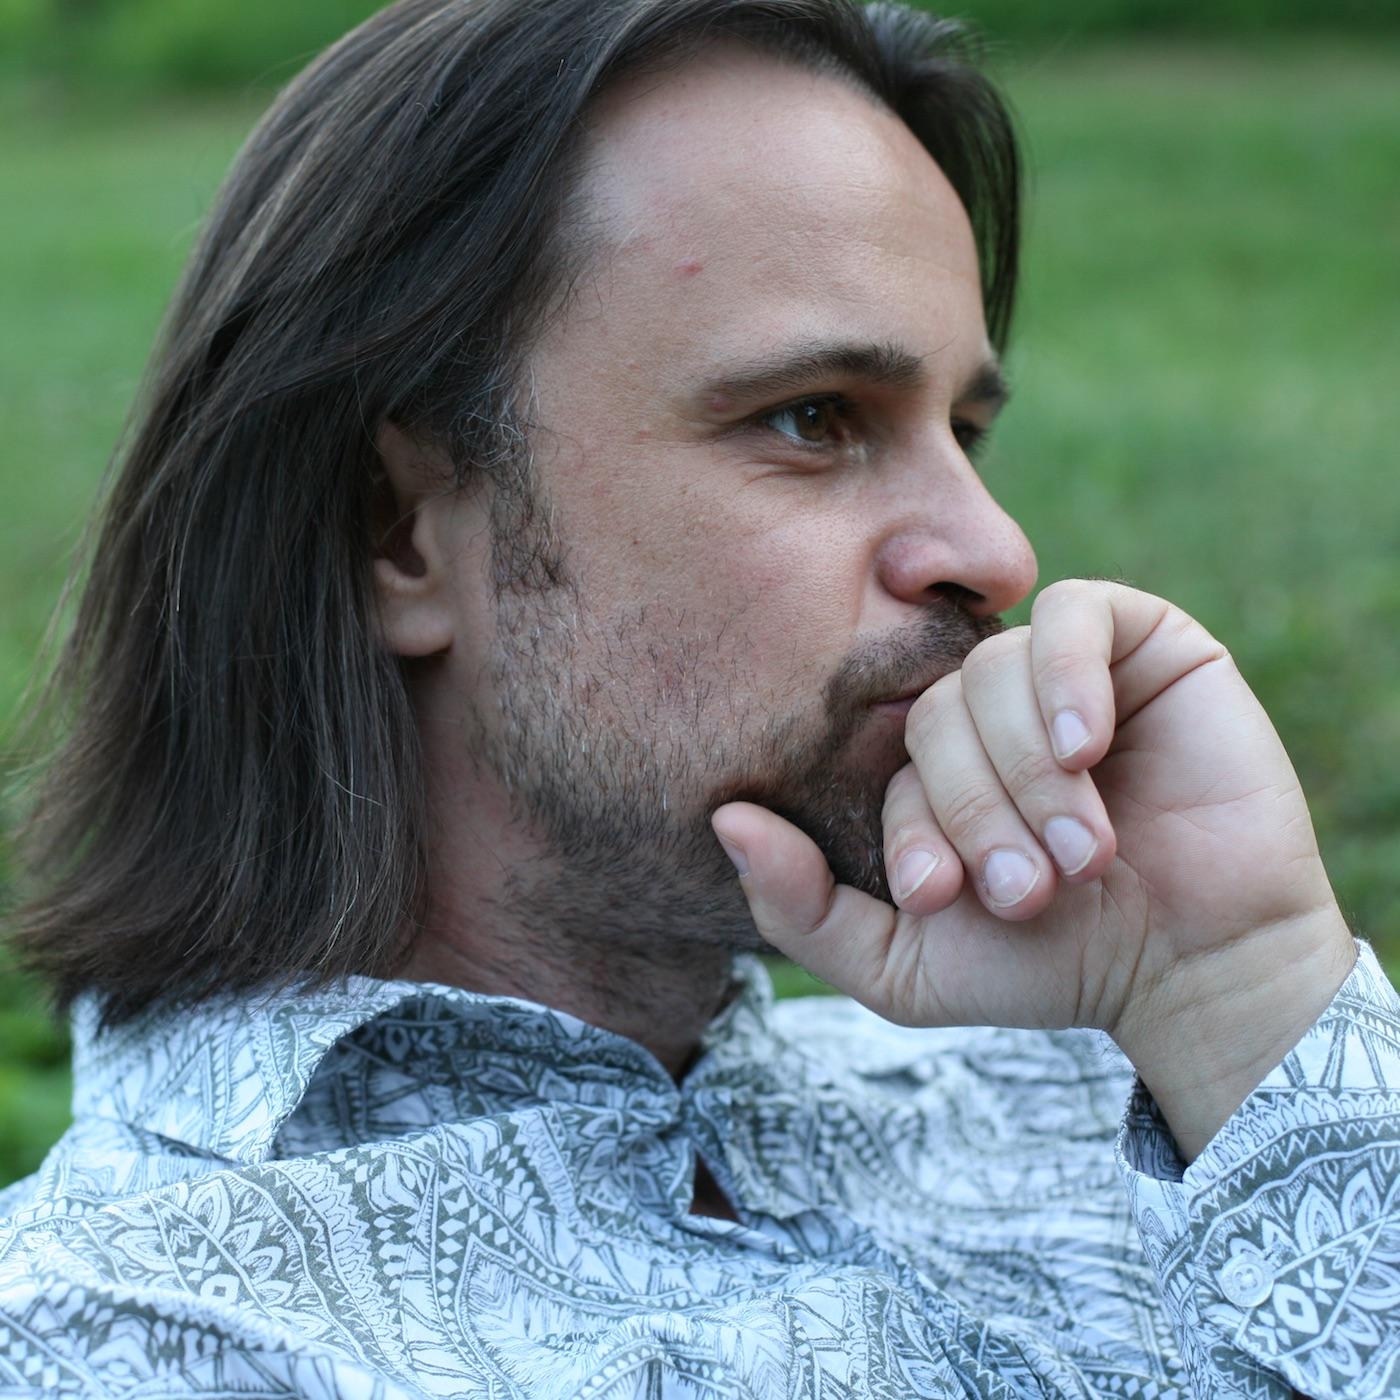 Patrik Balint je regresní terapeut, terapeut TOP a kouč